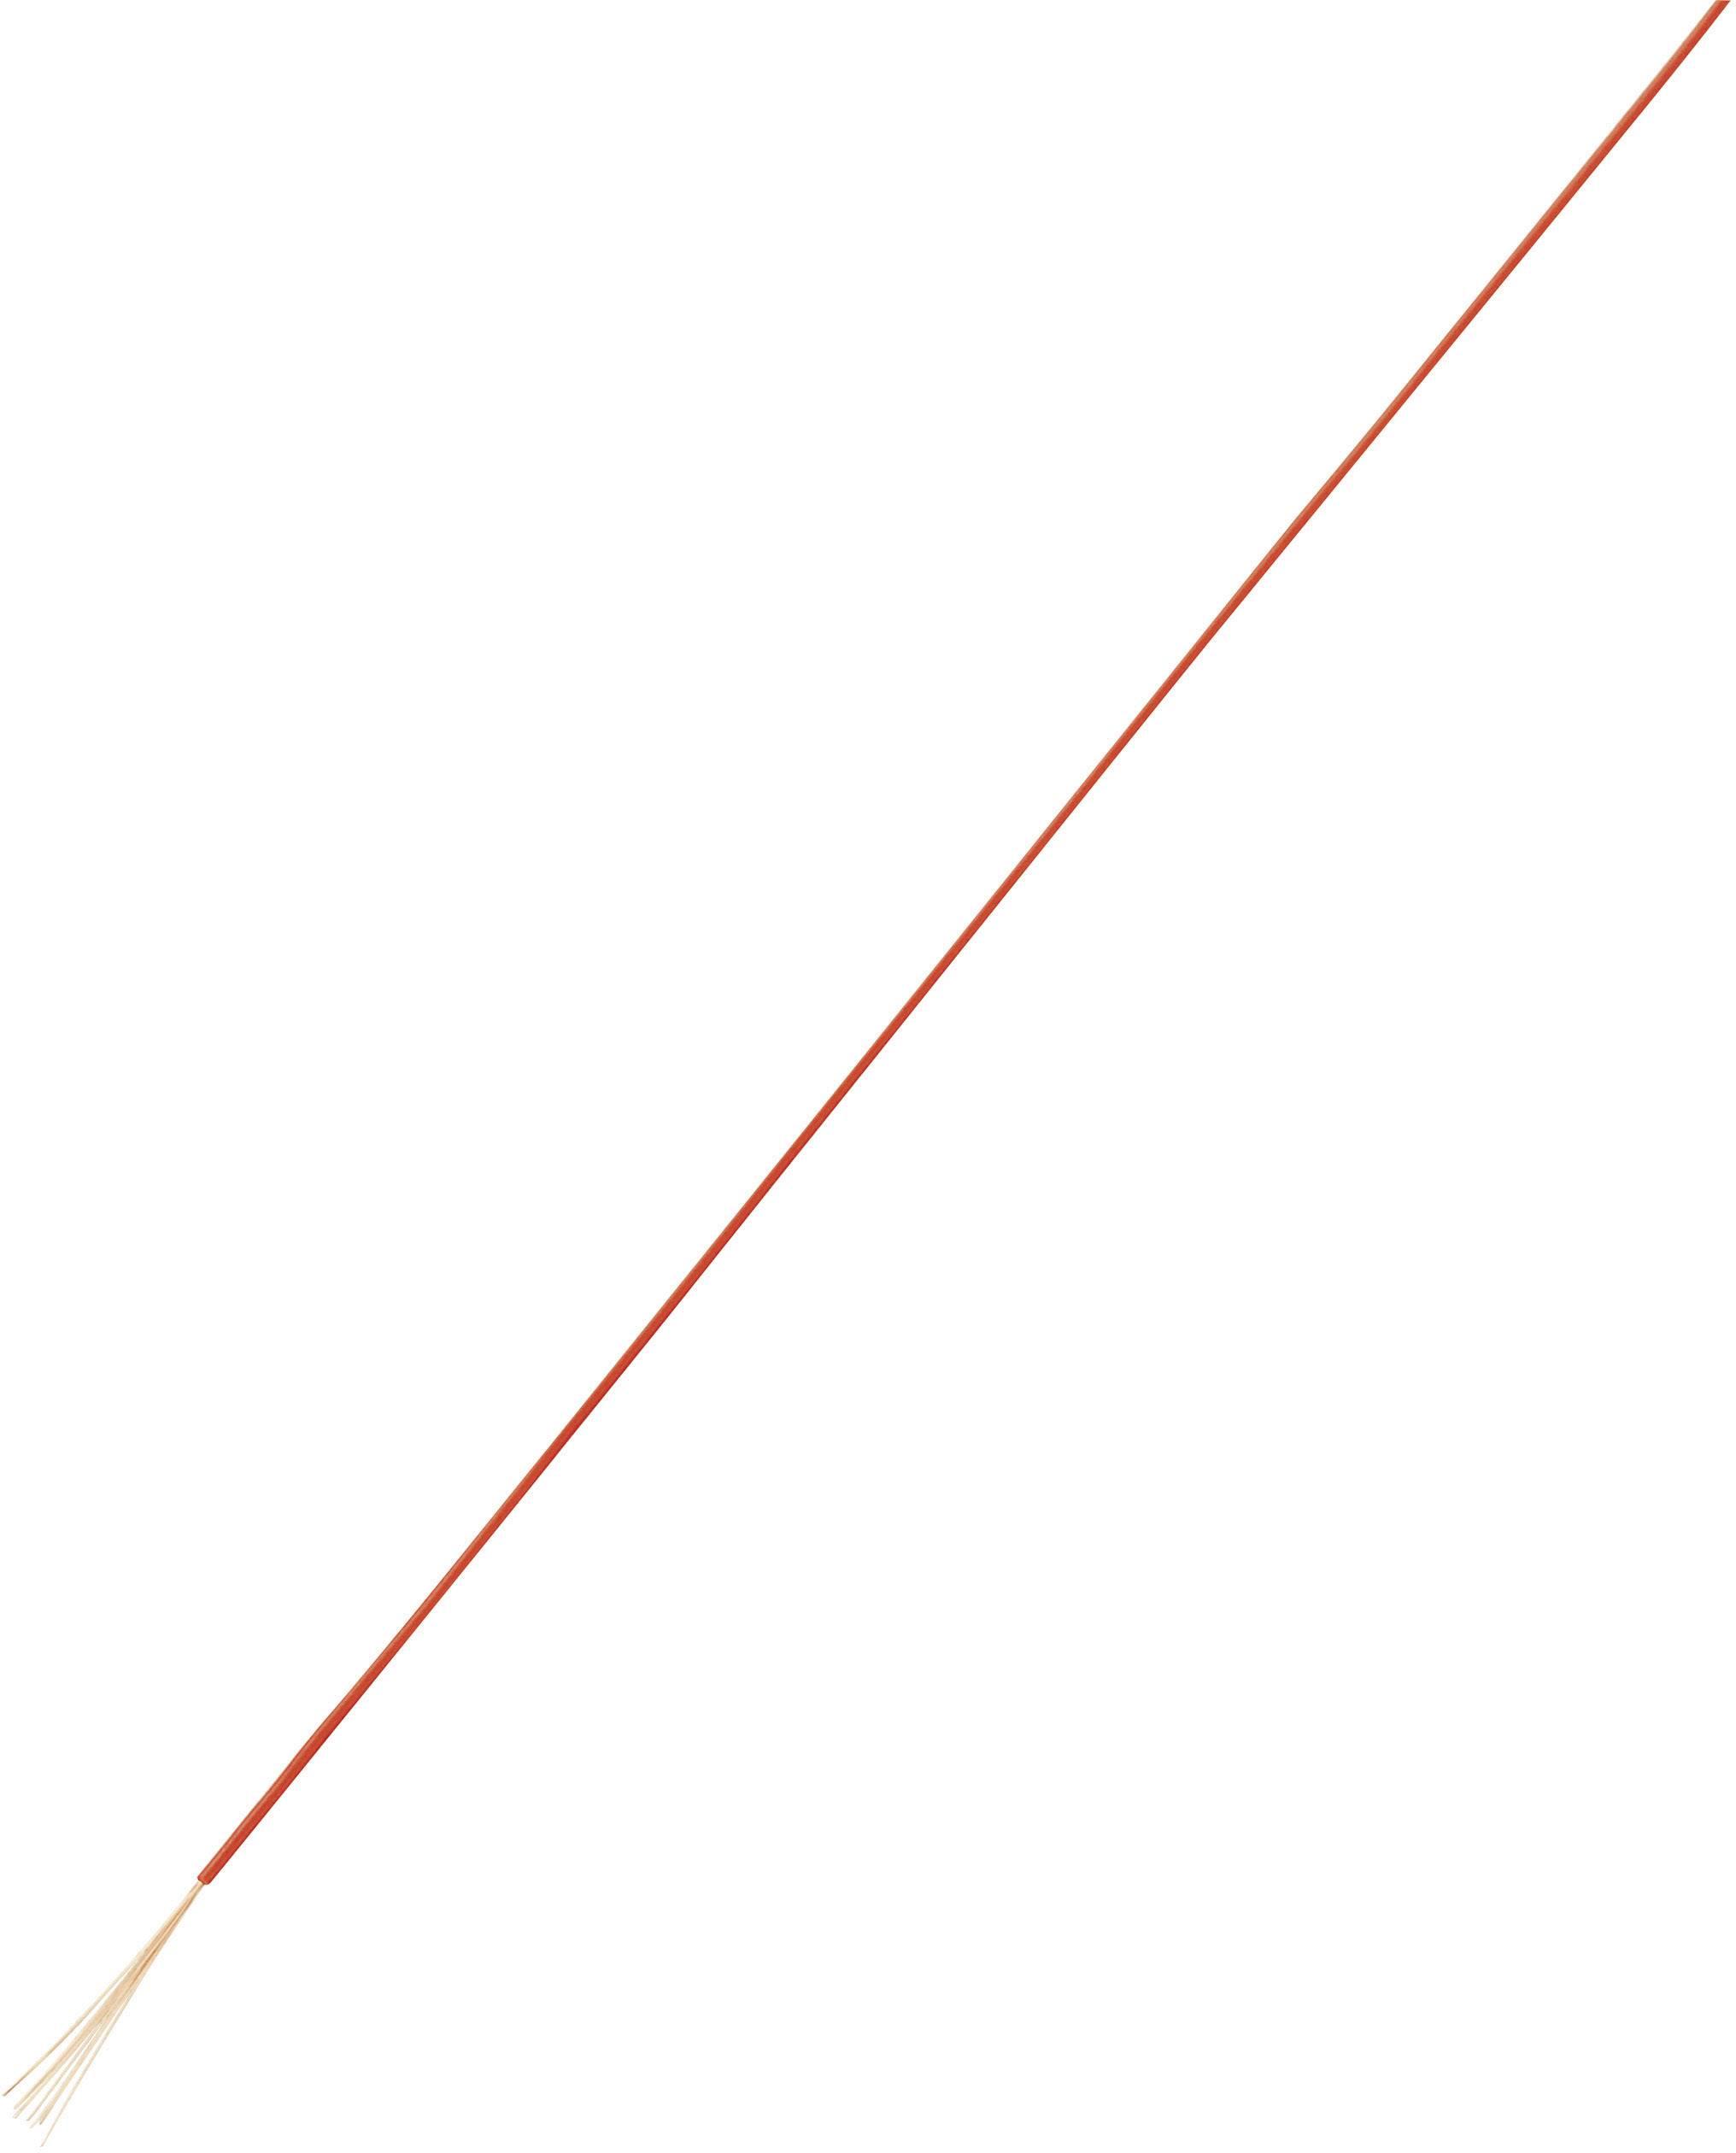 Opletenie / lanko Conrad Components 1180427 LiFY, 1 x 0.75 mm², vonkajší Ø 2 mm, 10 m, červená